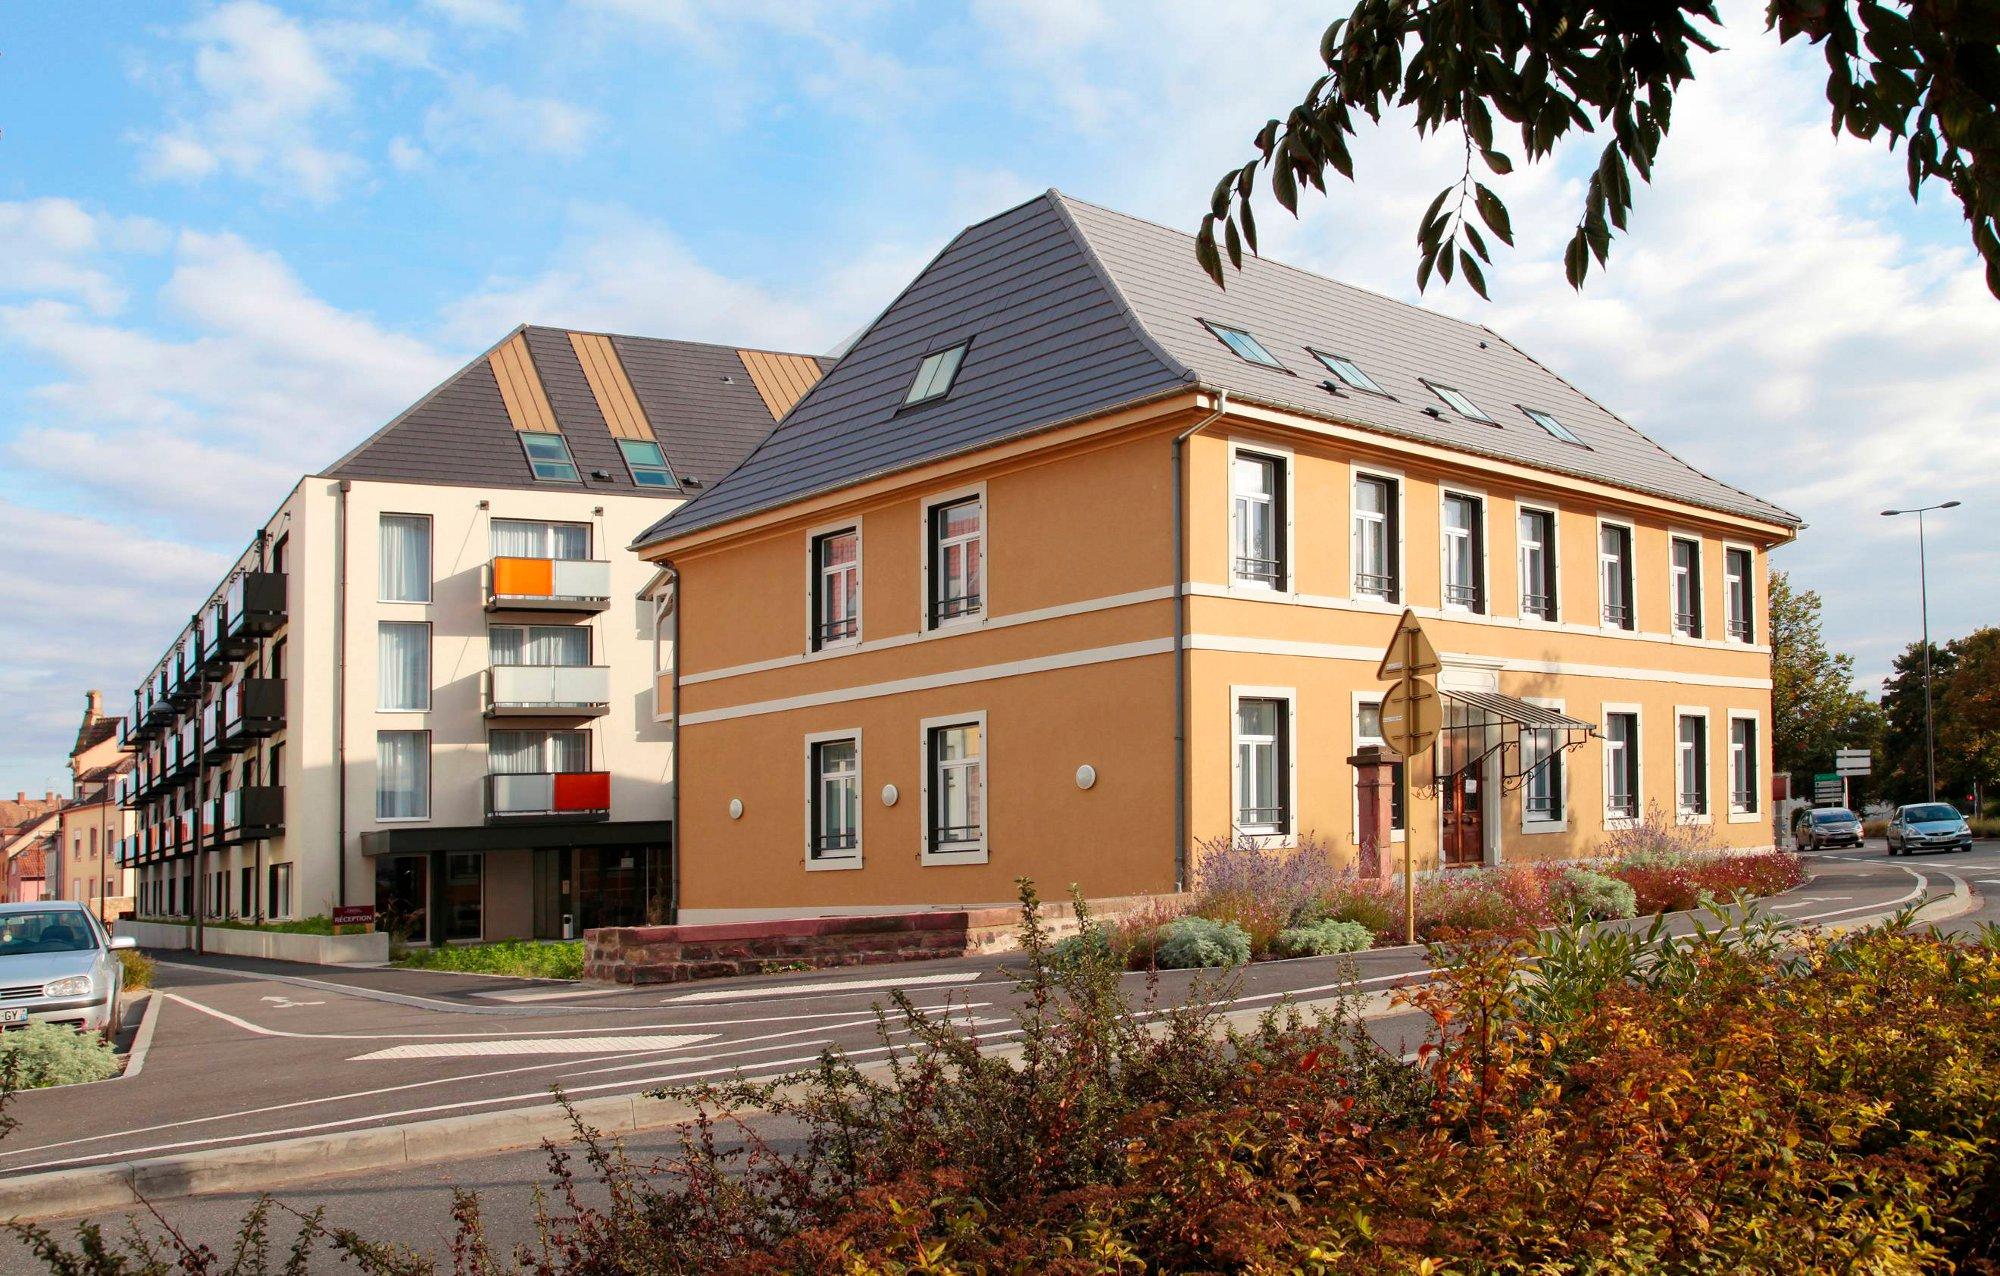 Colmar alsace france tourist office la rose d 39 argent for Hotels colmar